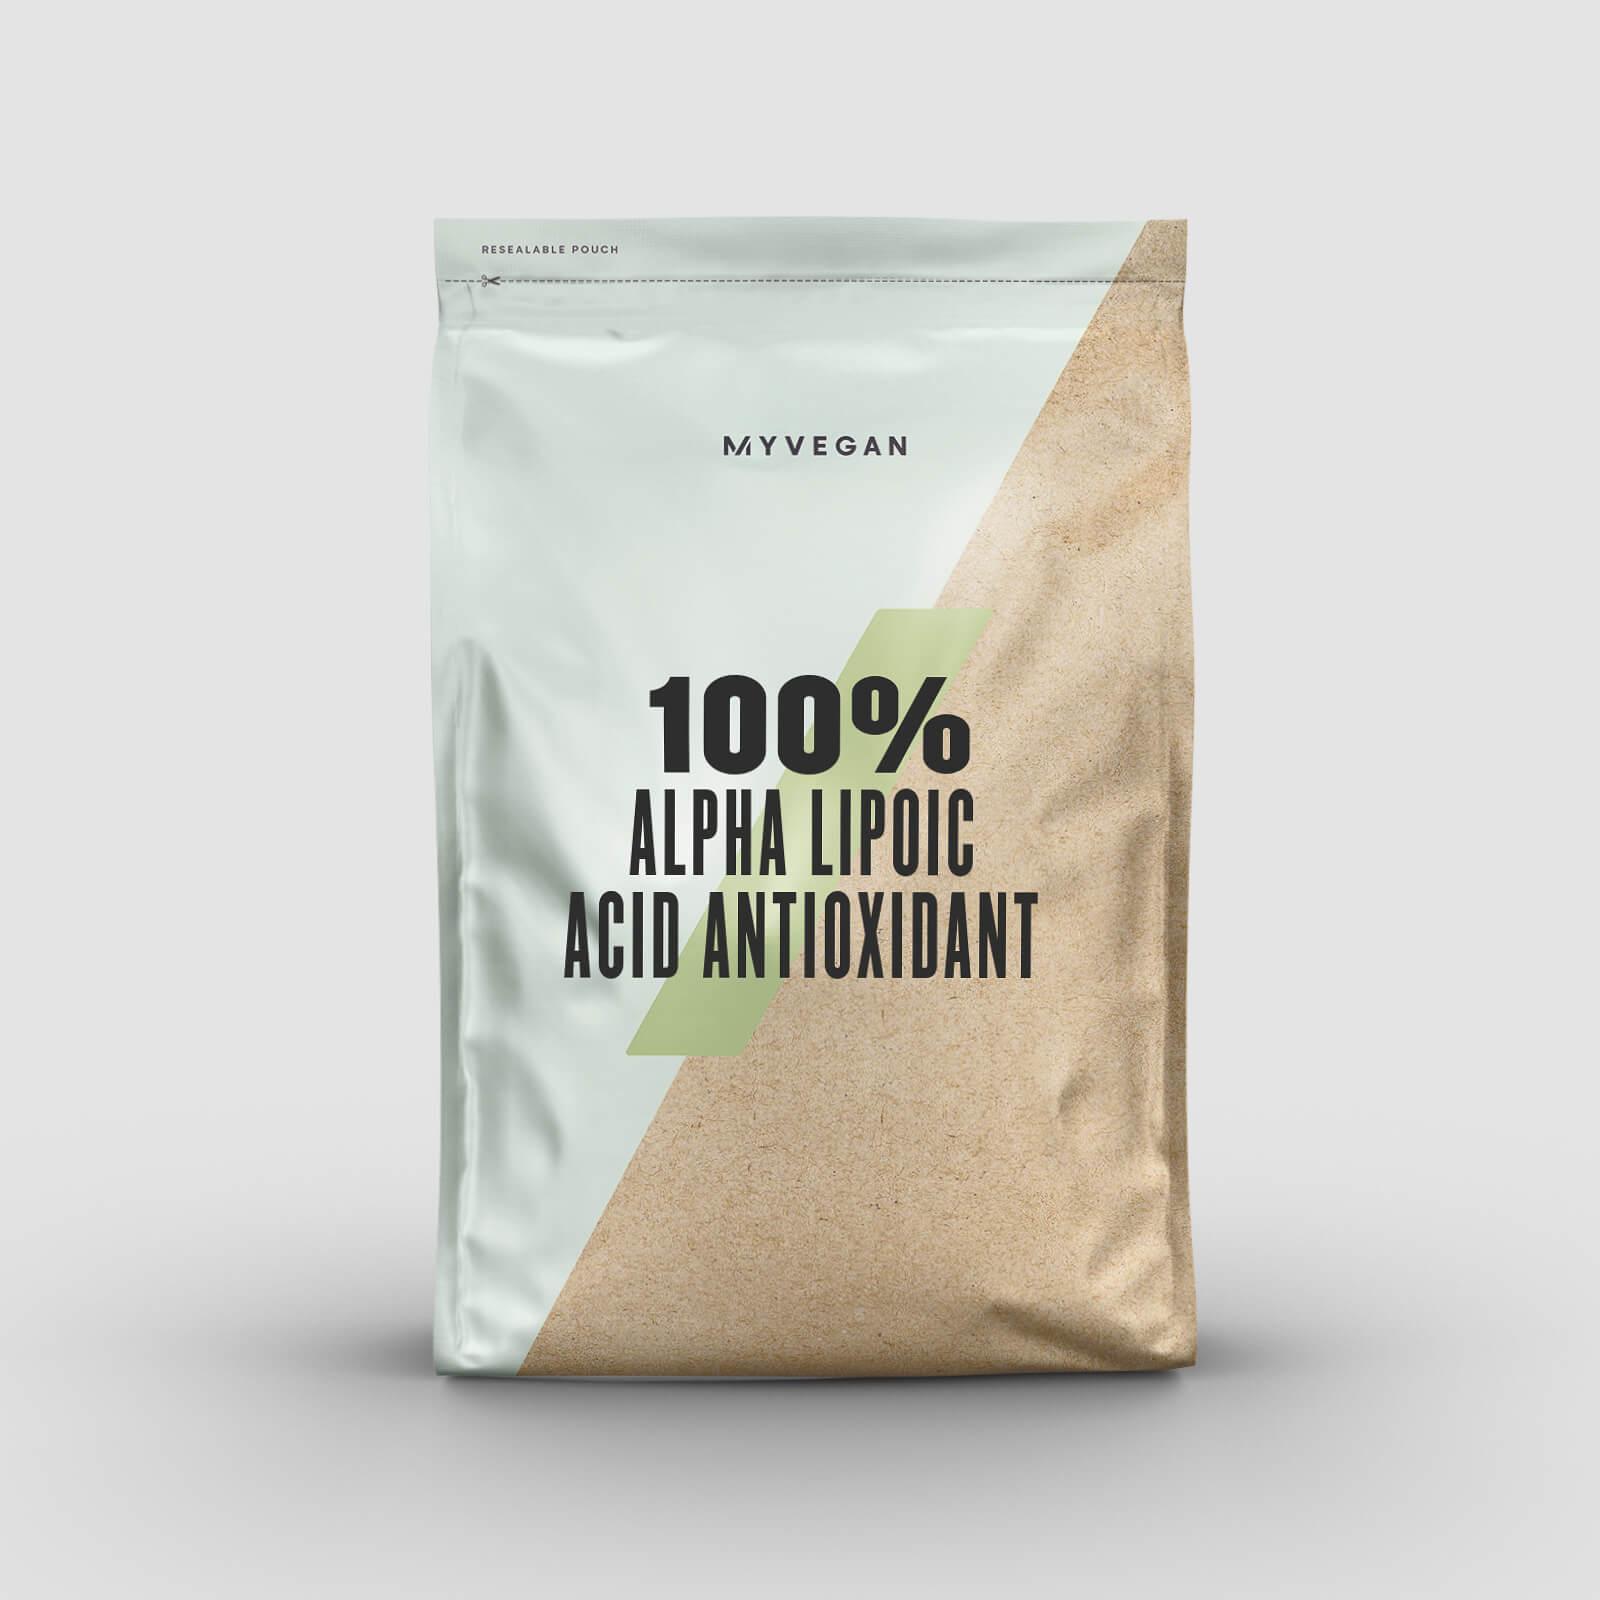 Myprotein Ácido Alfa Lipoico en polvo - 100g